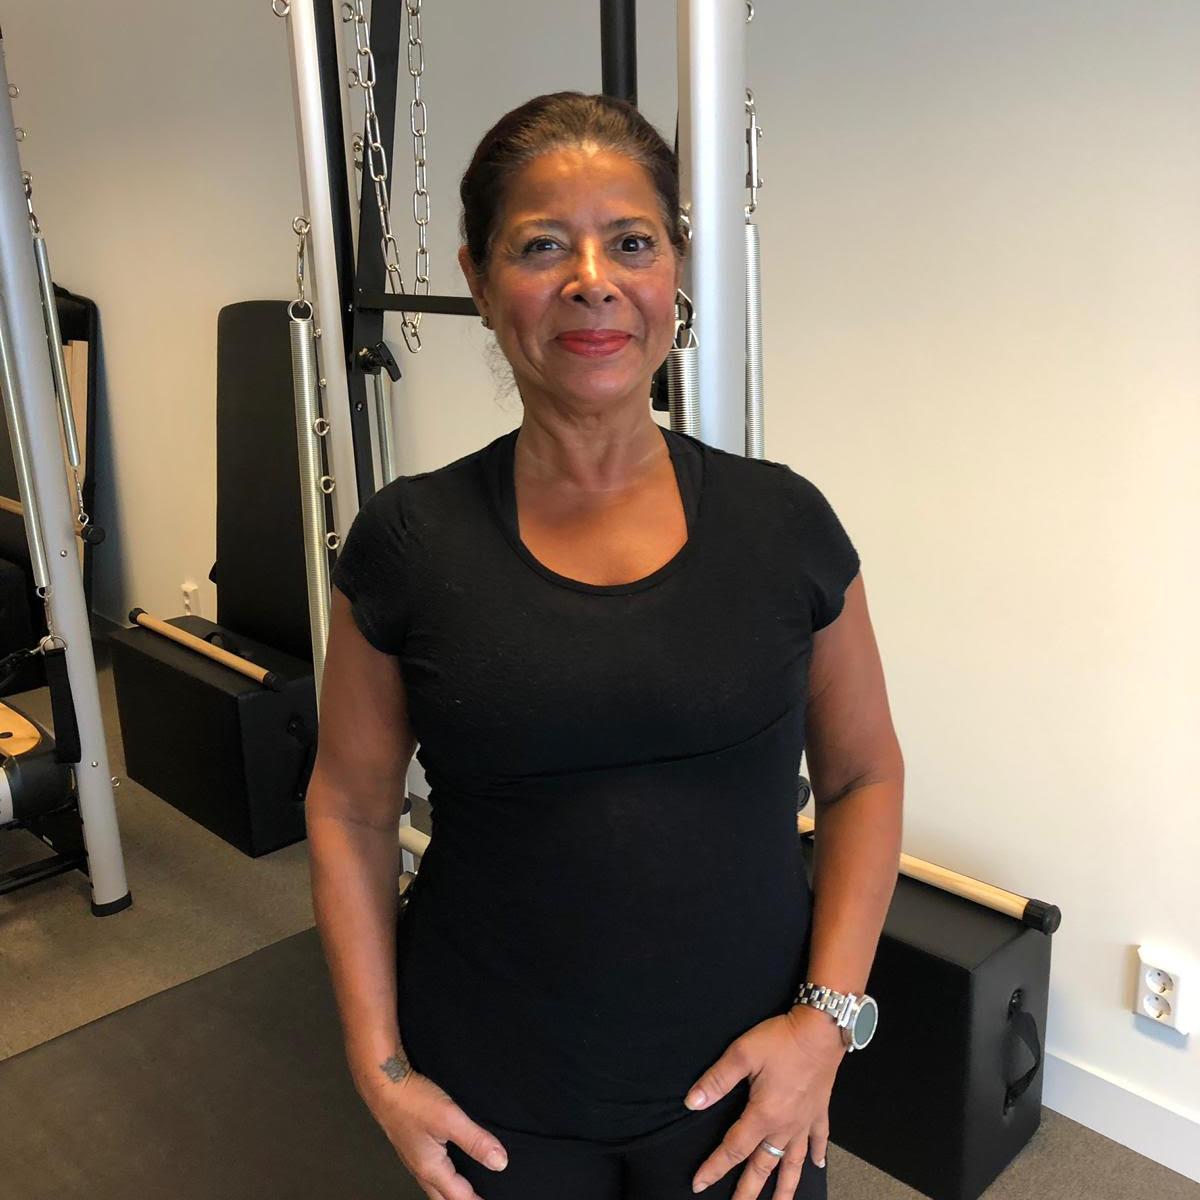 Cordelia Team Sturdy Personal Trainer